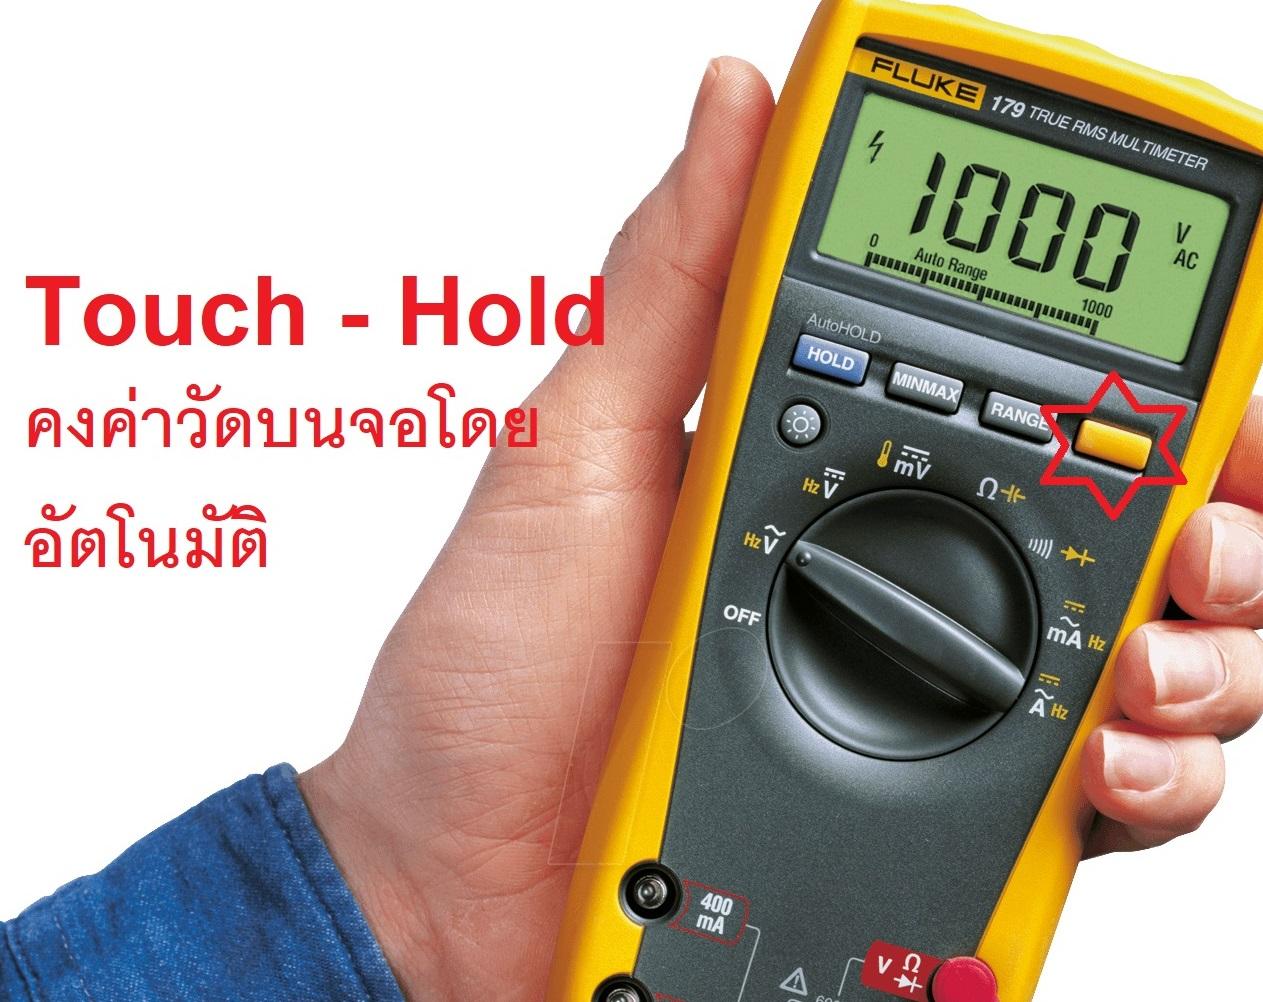 Touch Hold - คงค่าวัดบนจอโดยอัตโนมัติ